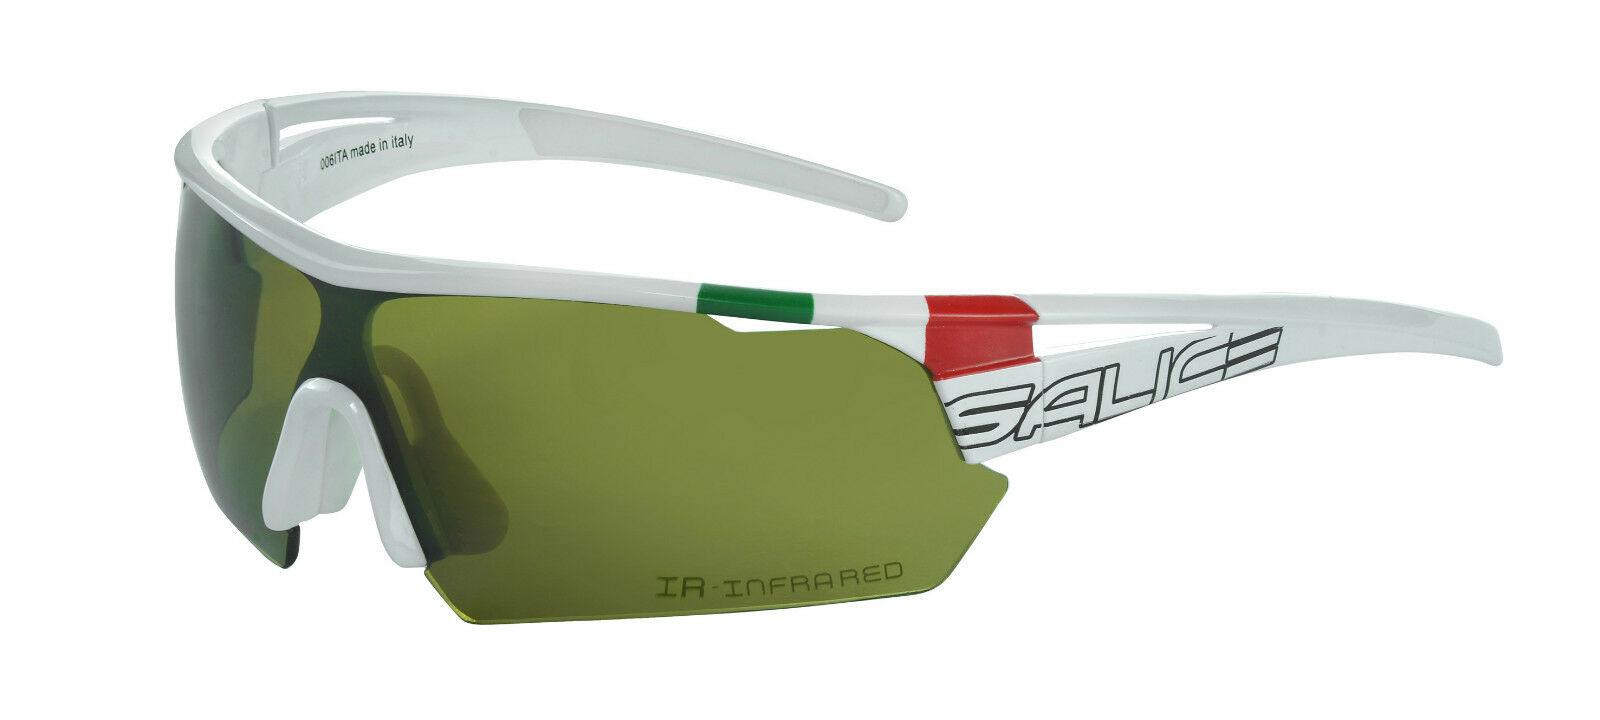 Glasses salice mod.006ita white rainbow infrared lens glasses salice 006ita   for wholesale